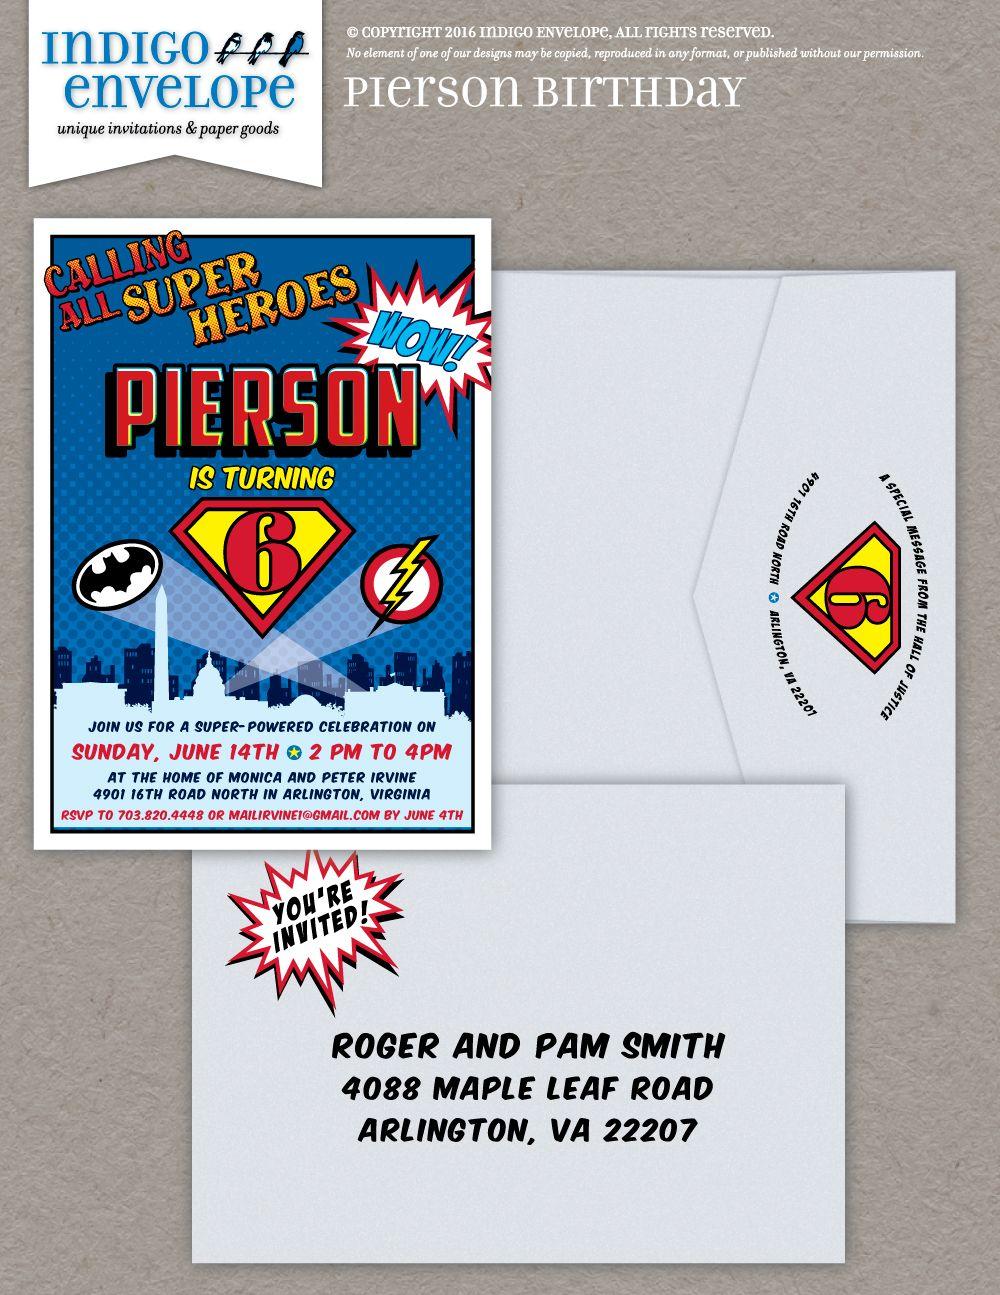 Superhero birthday party invitation | Design by Indigo Envelope ...